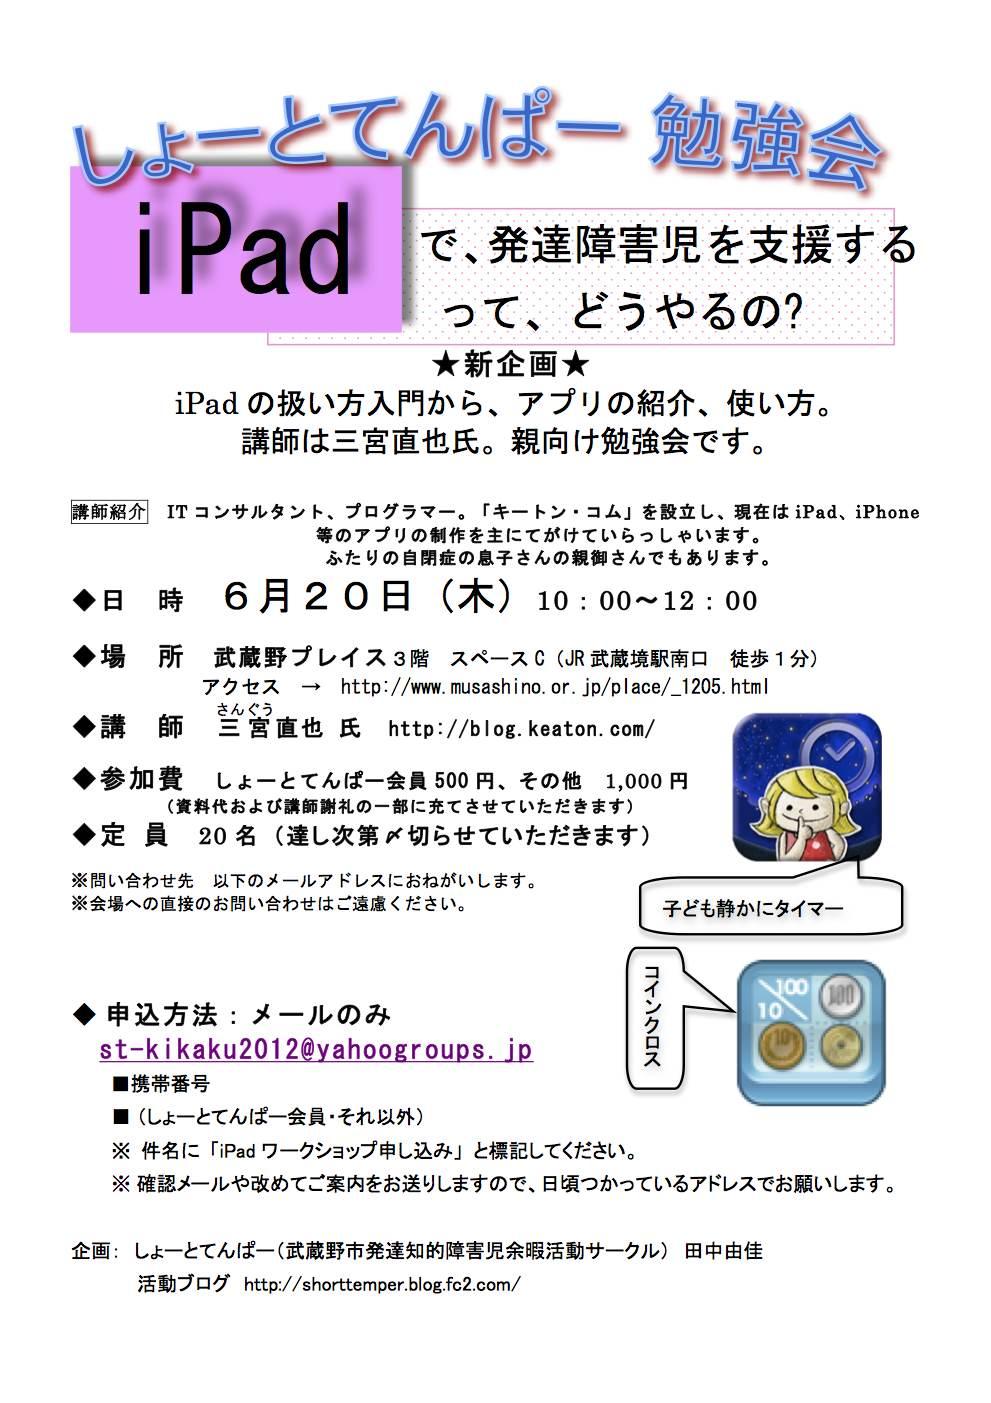 iPadチラシ